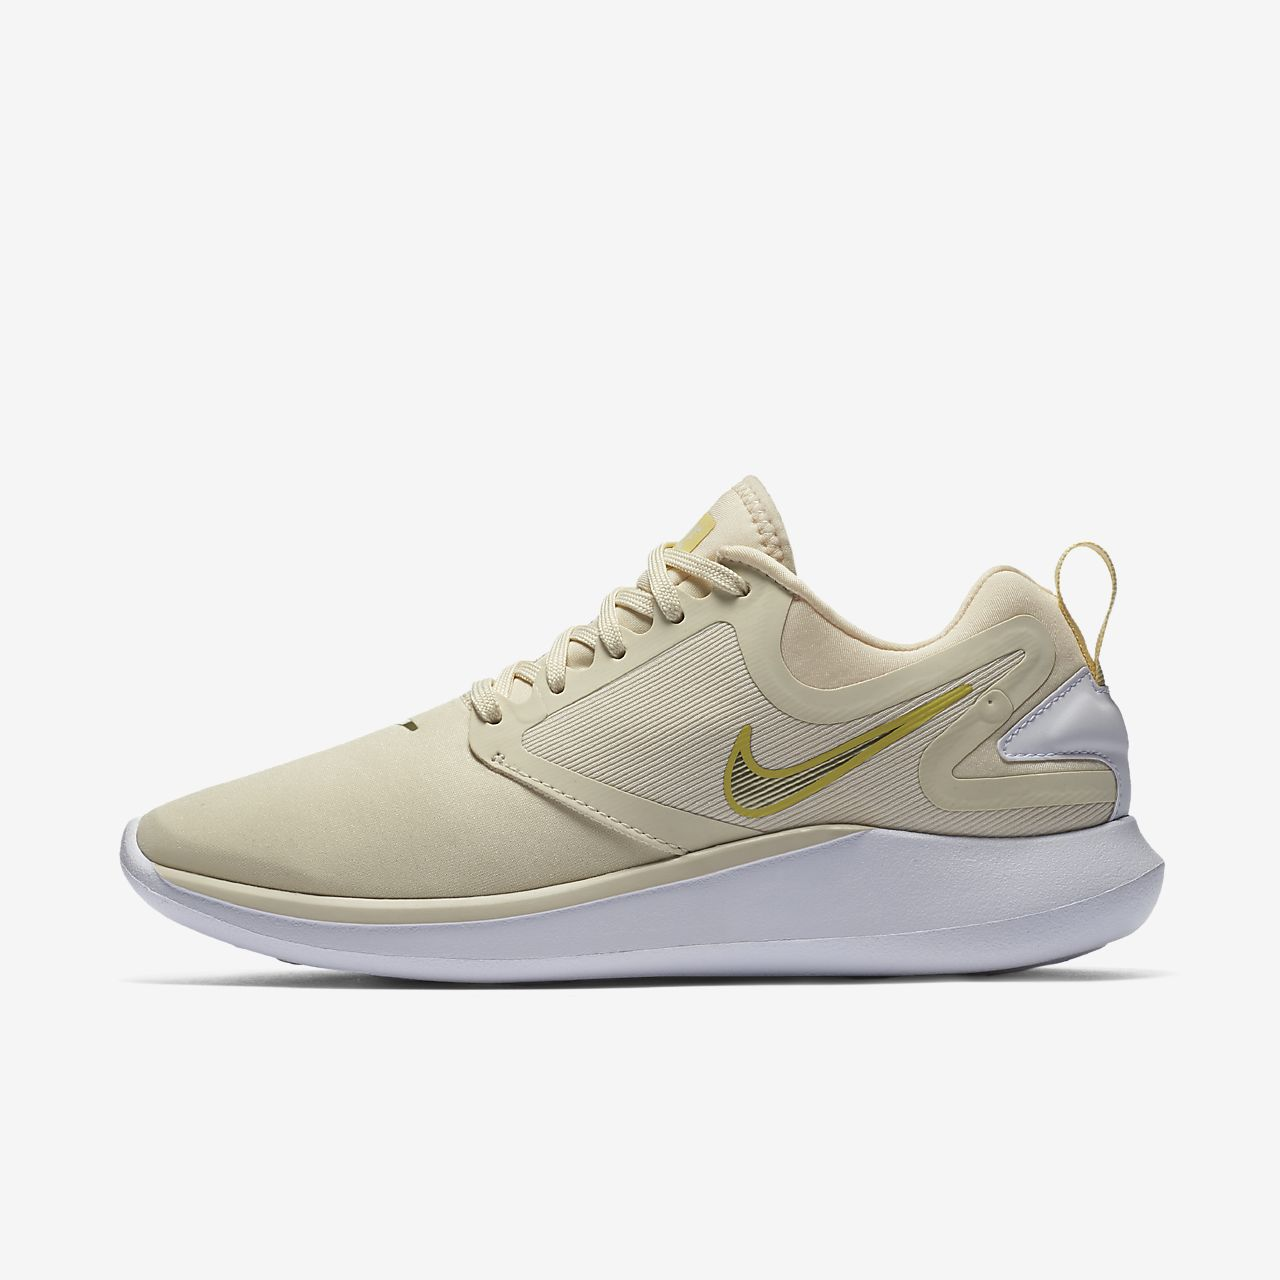 Nike Running - Lunarsolo - Baskets - Noir et blanc g7dctOB